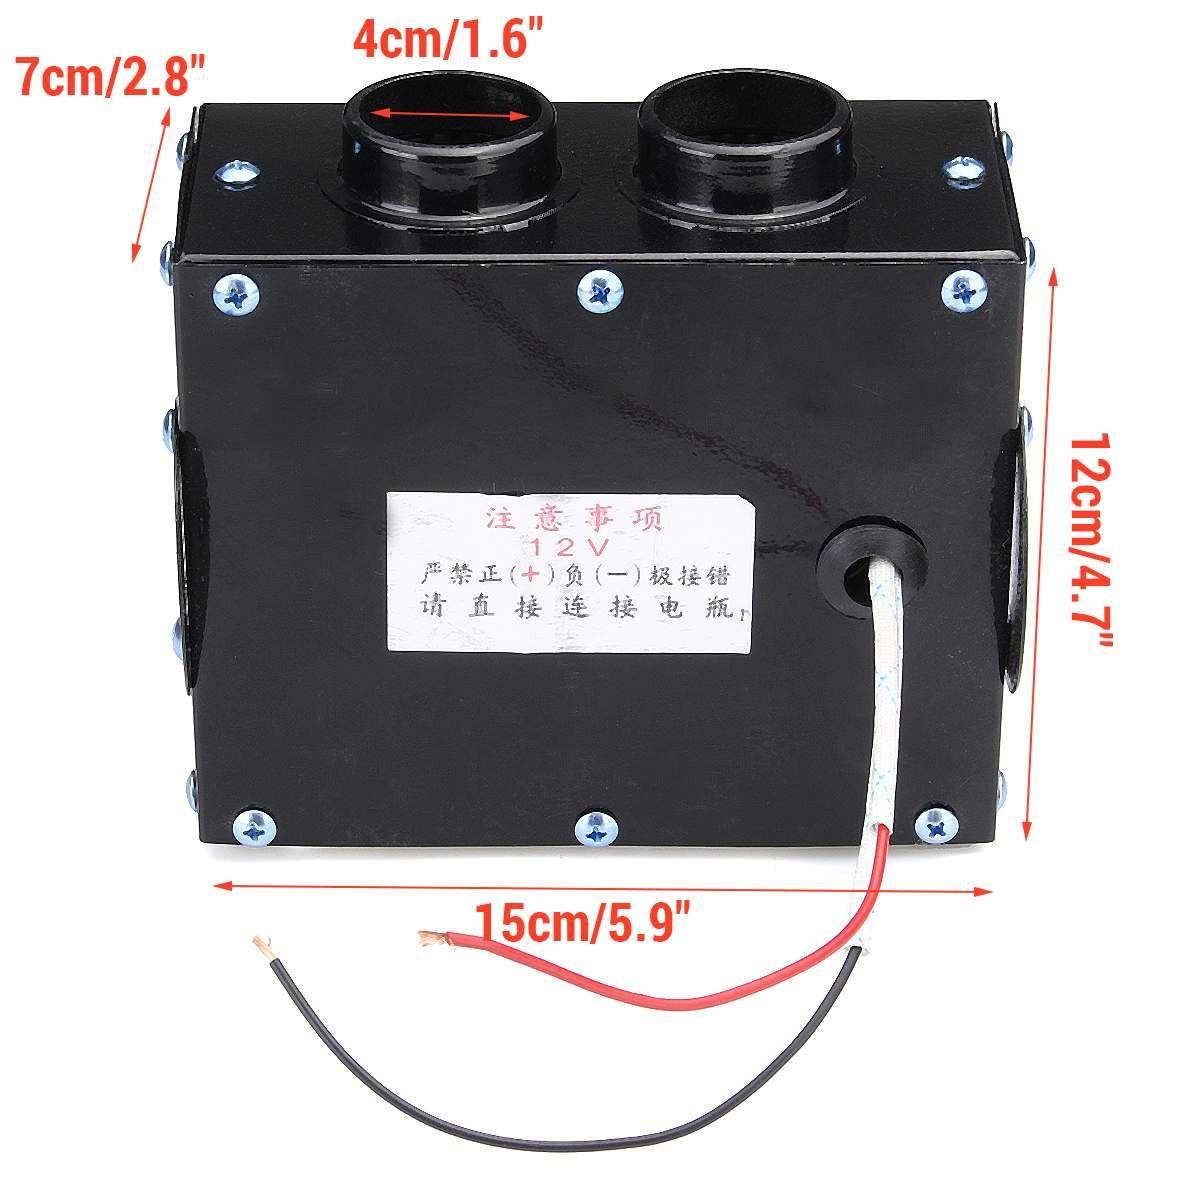 400w 12v Car Fan Heater Heating Winter Warm Windshield Glass Defroster Demister Parts & Accessories